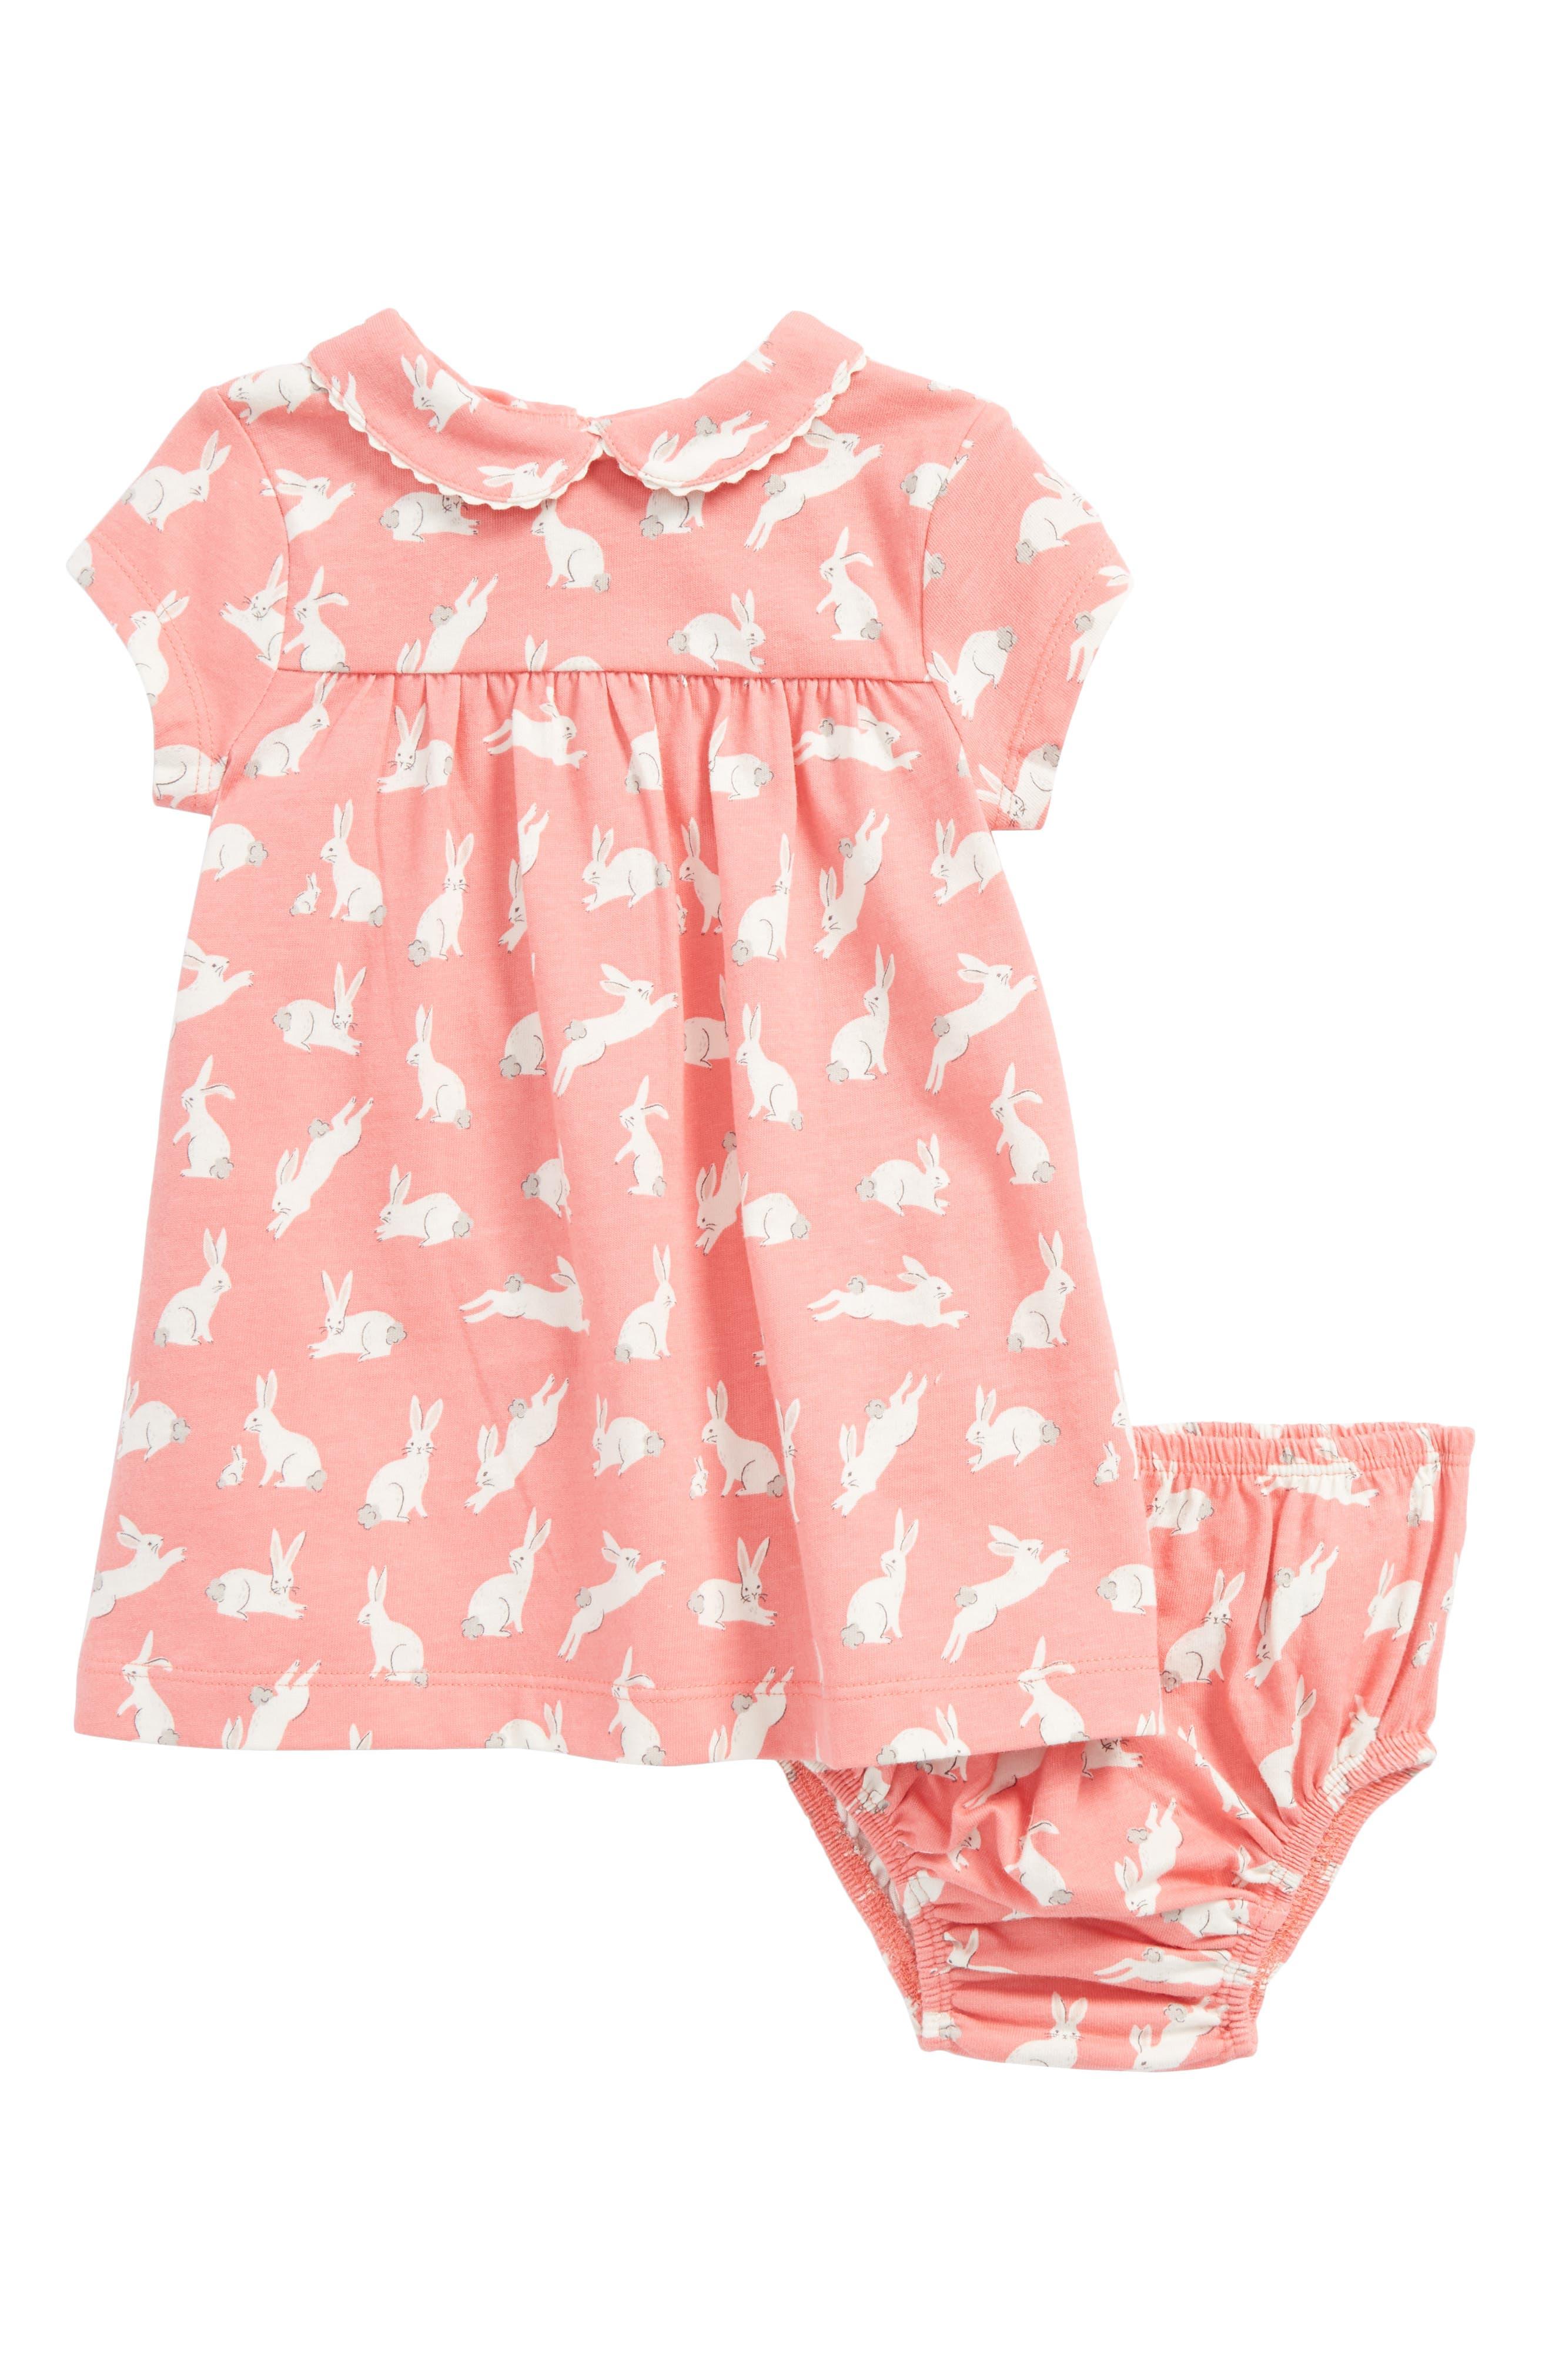 Main Image - Mini Boden Bunnies Print Jersey Dress (Baby Girls & Toddler Girls)